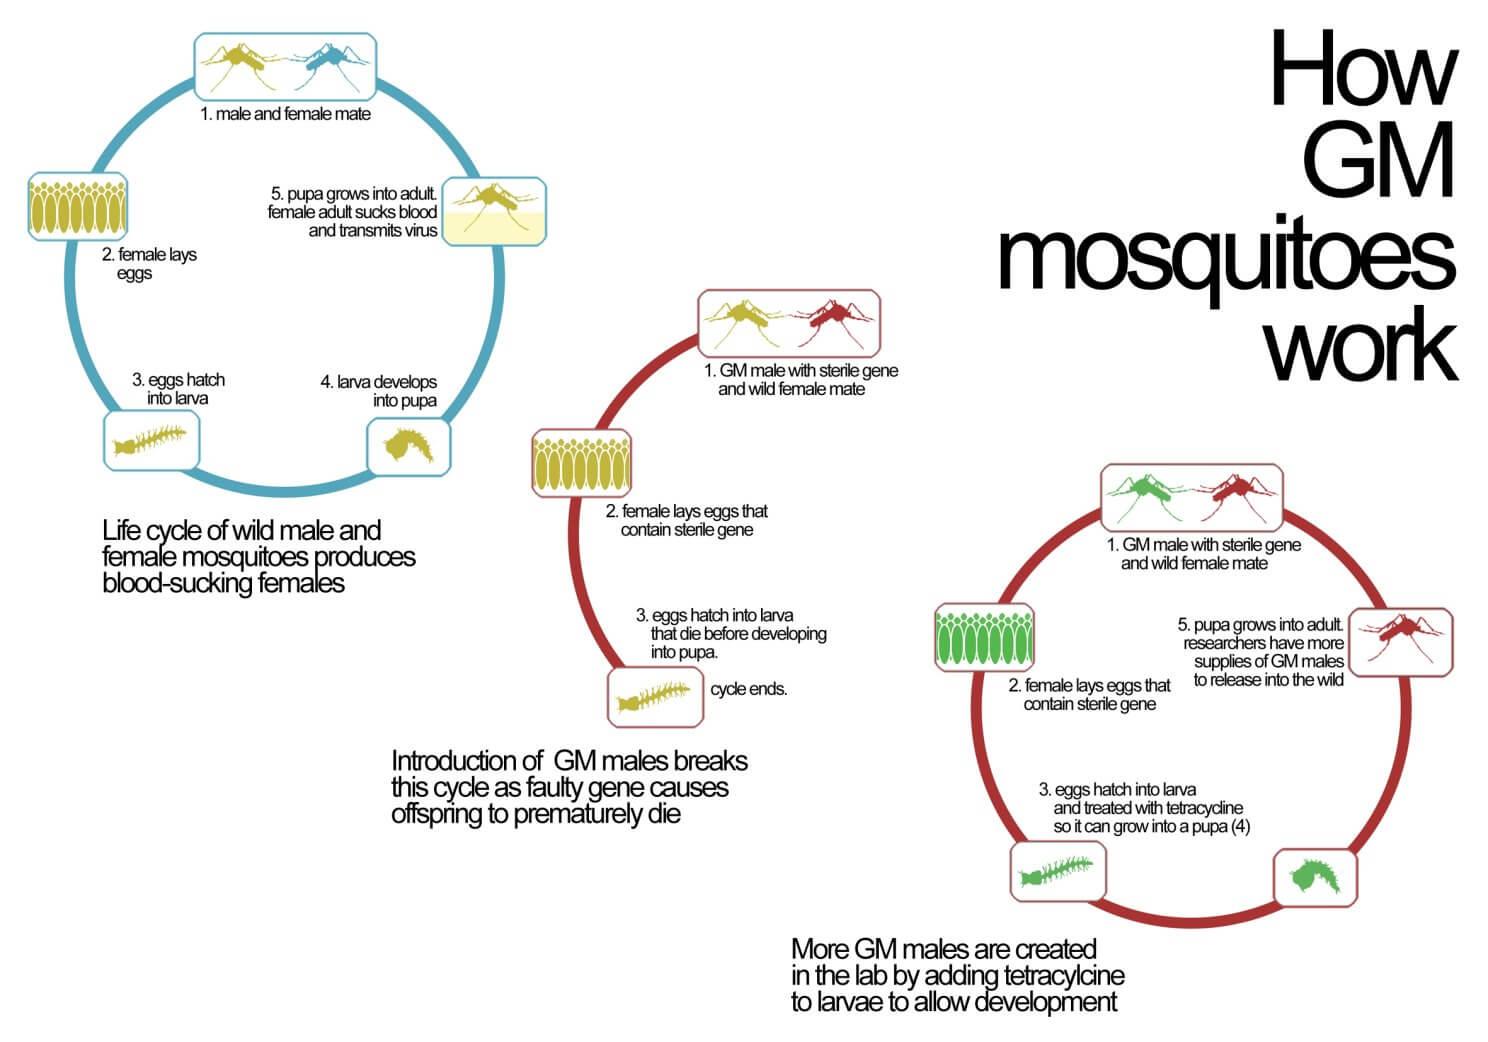 microcephaly-drawing-child-zika-gm-mosquito-virus2